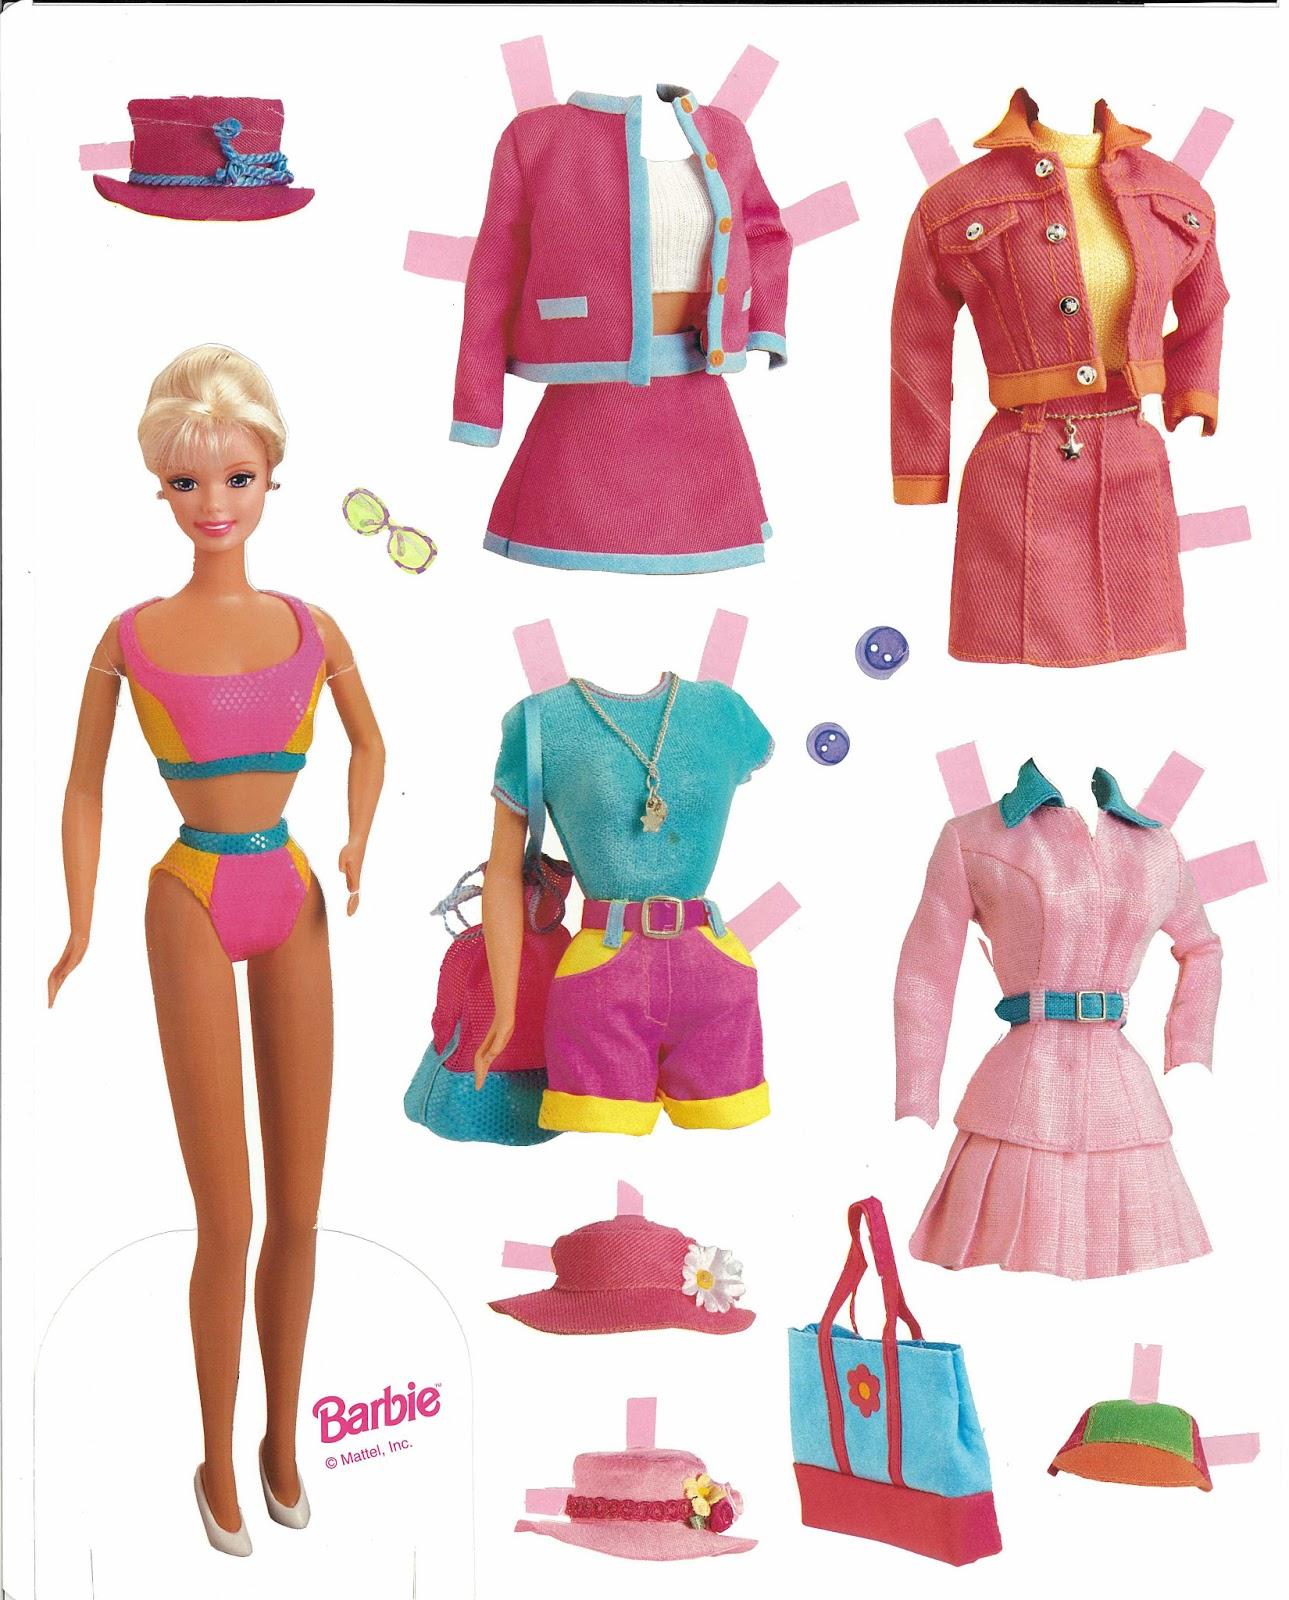 Fan image regarding printable barbie paper dolls